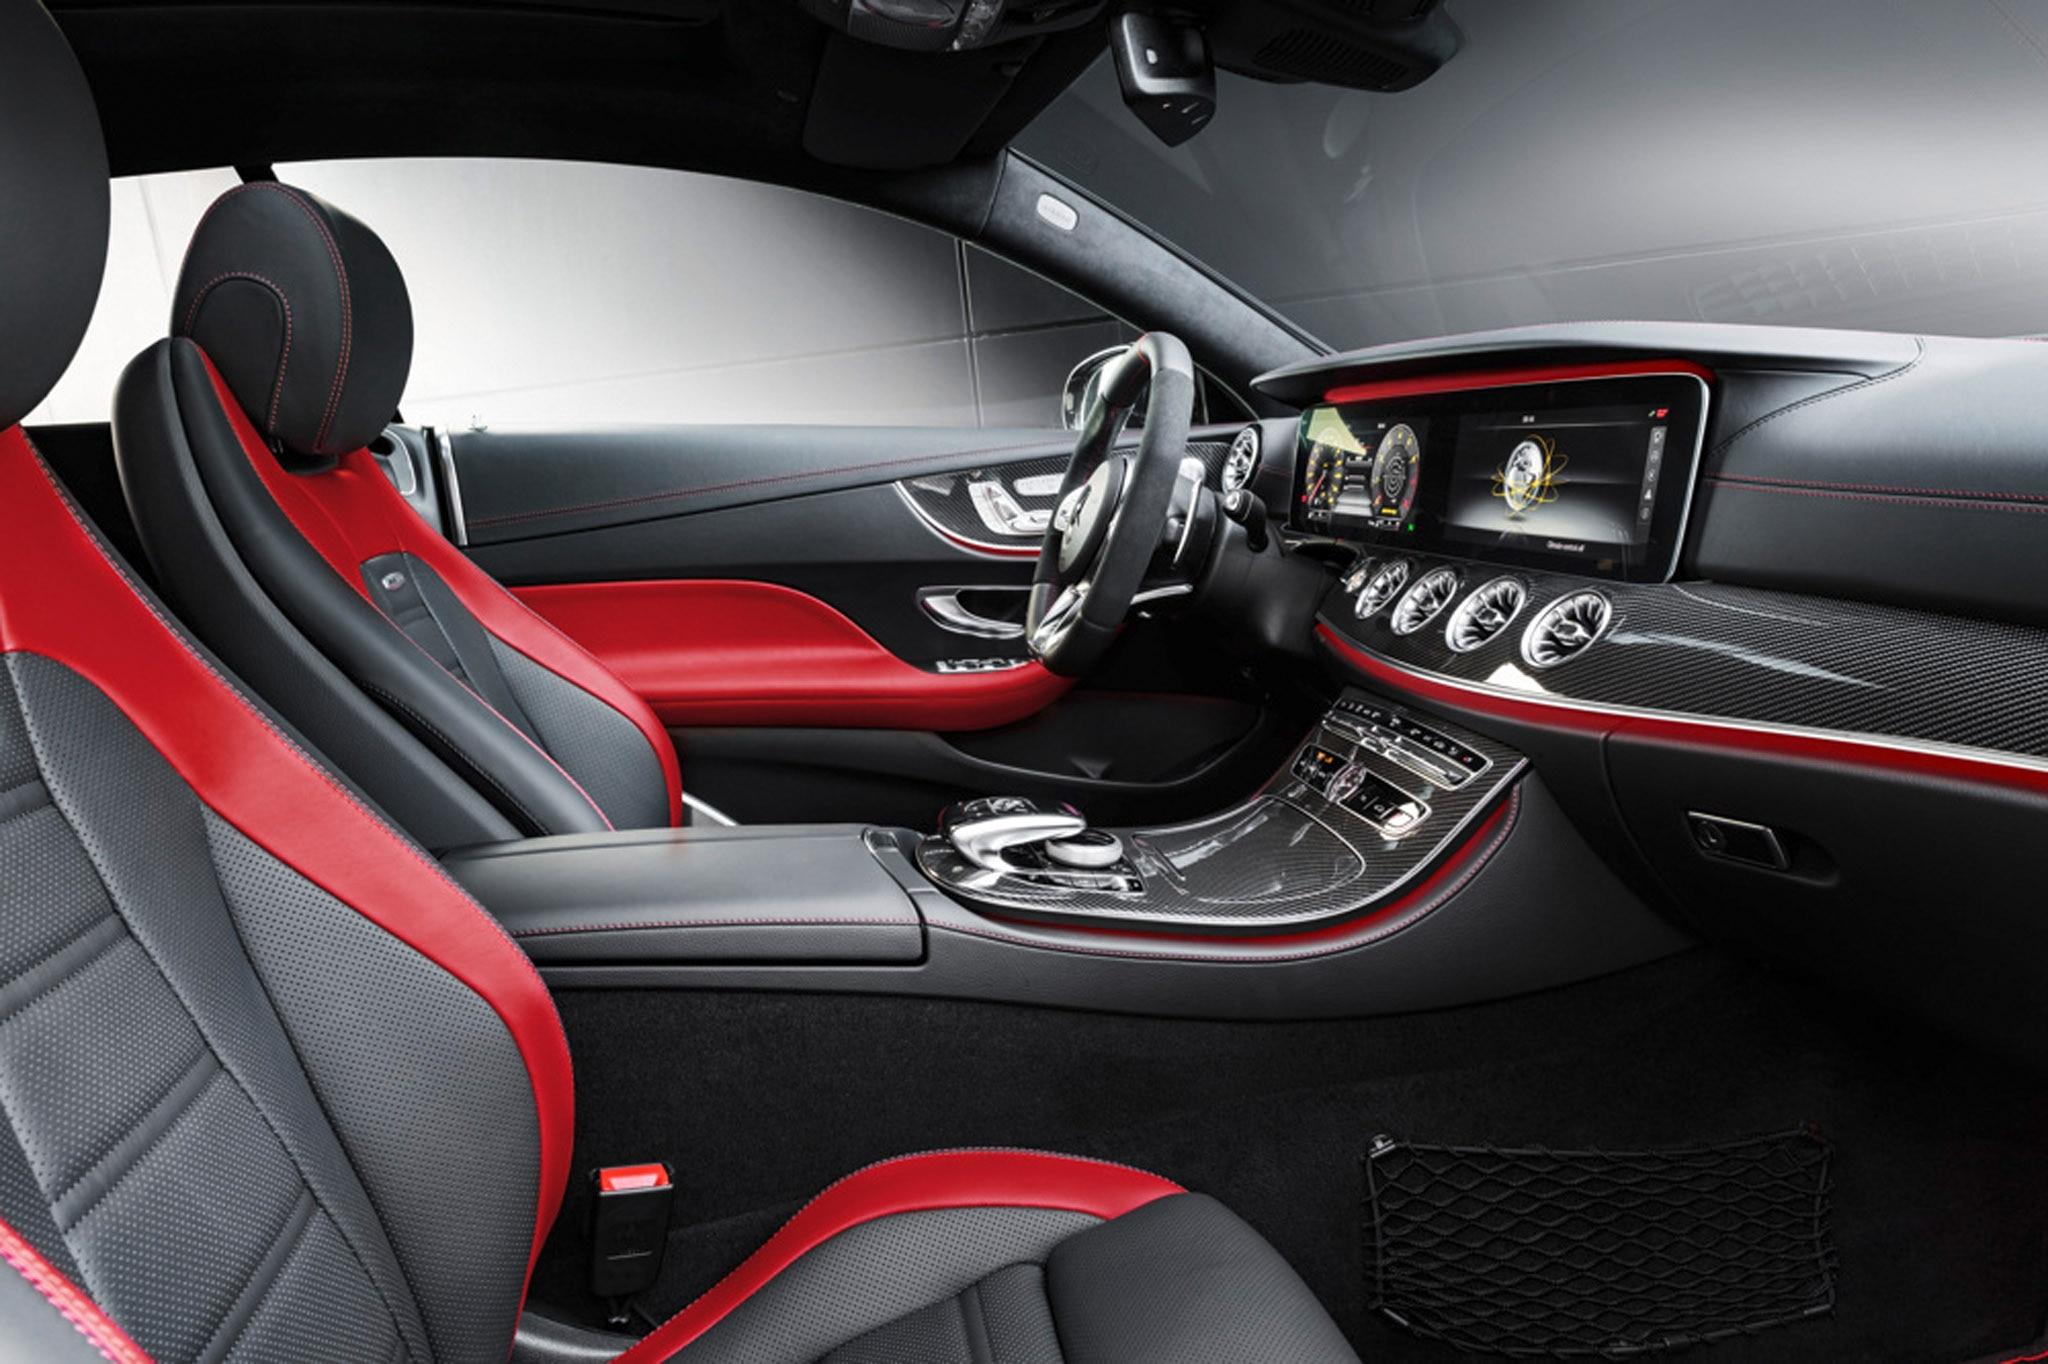 http://st.automobilemag.com/uploads/sites/11/2018/01/2019-Mercedes-AMG-E-53-Coupe_01.jpg